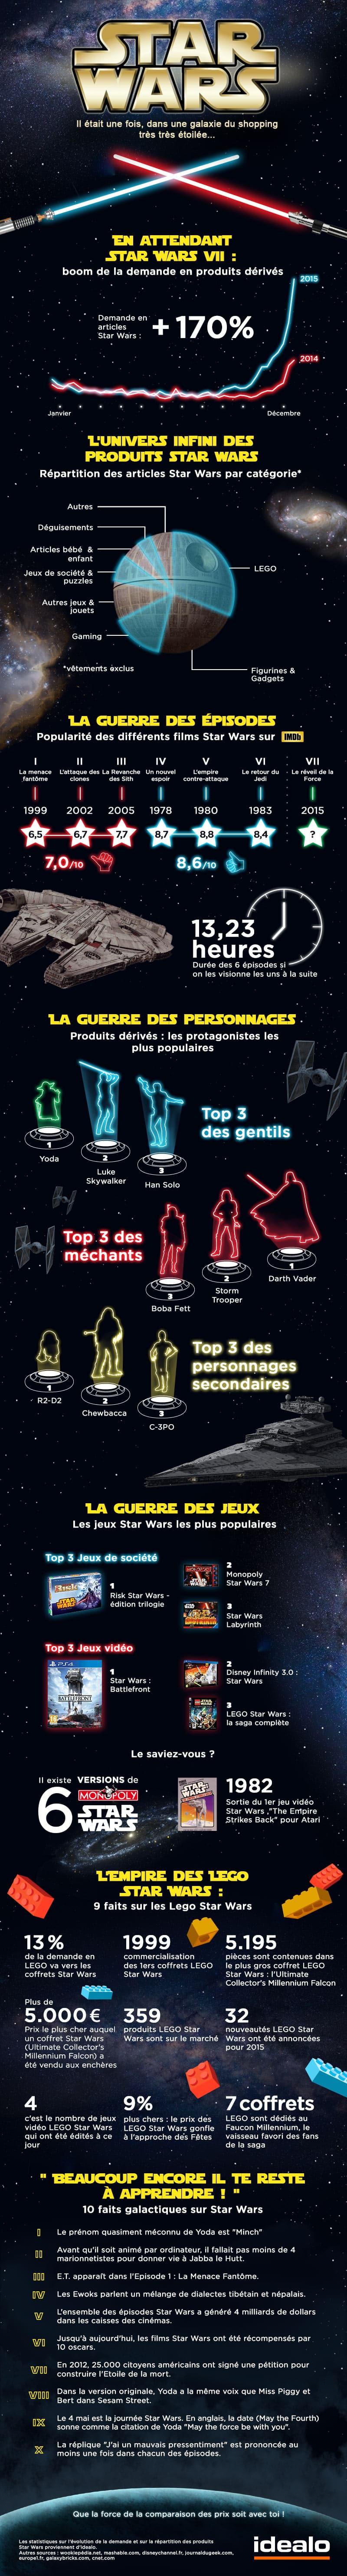 Star-Wars-Infographie-Idealo